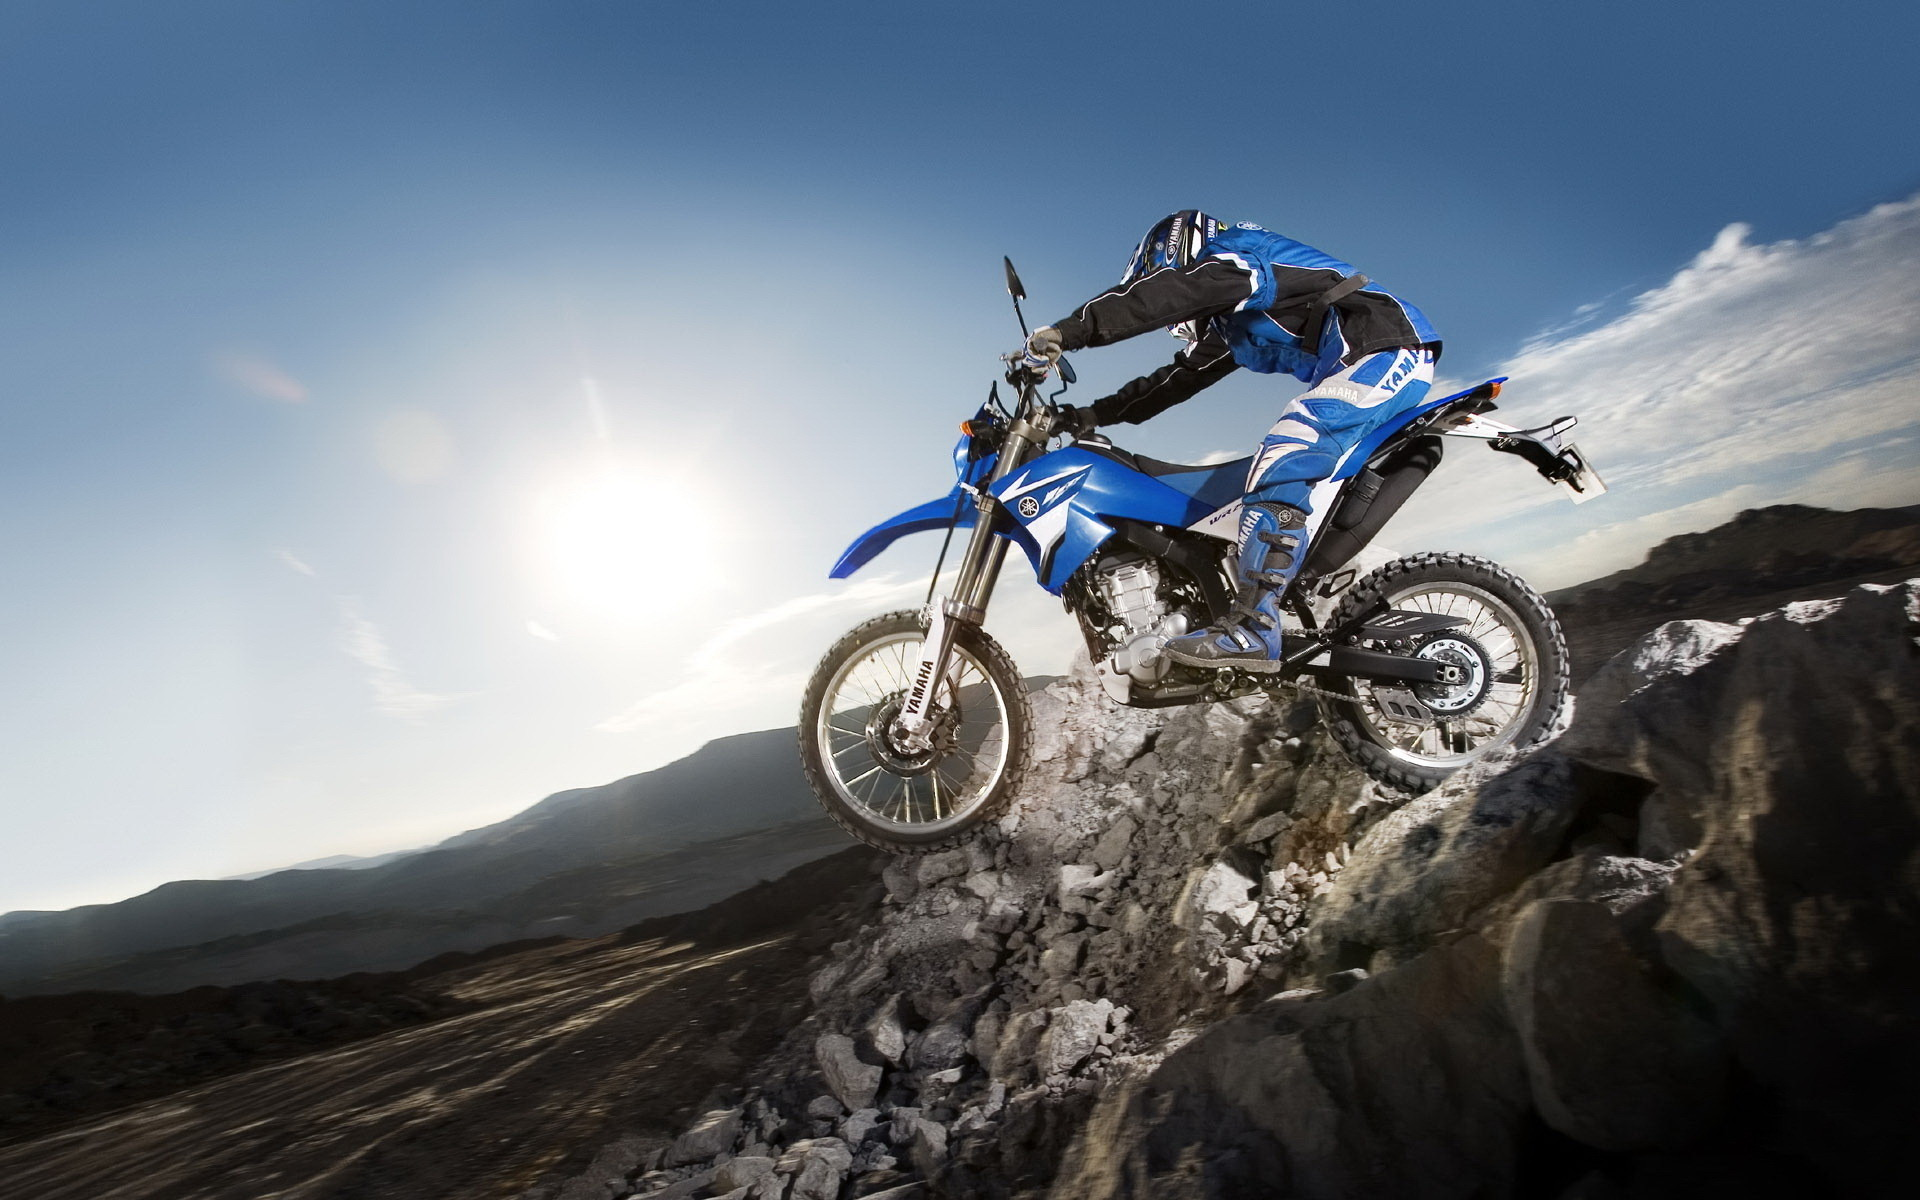 Yamaha Dirt Bike Wallpaper 64 images